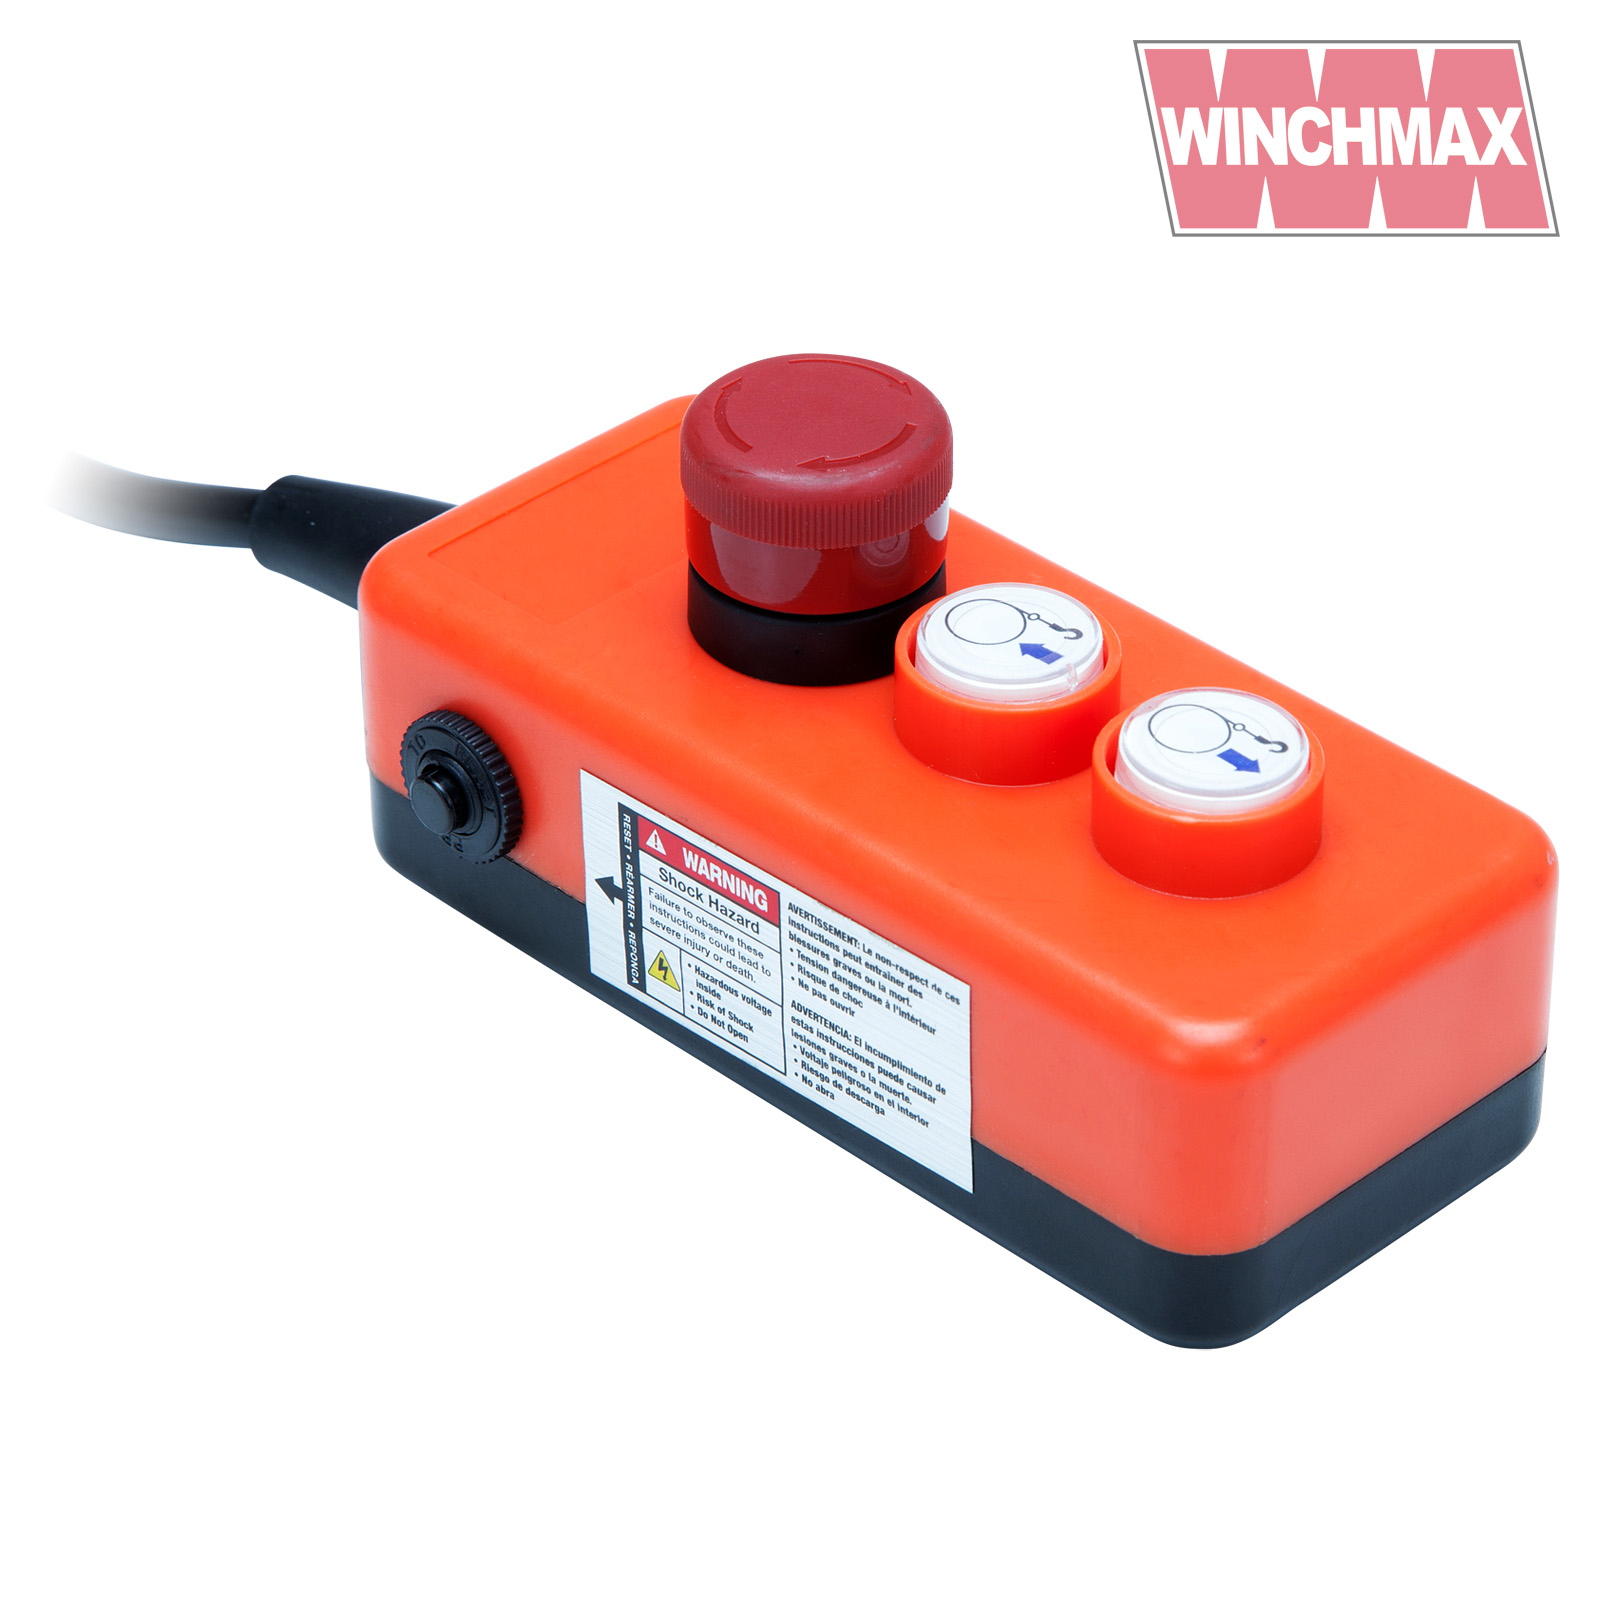 Wmac3000 winchmax 244